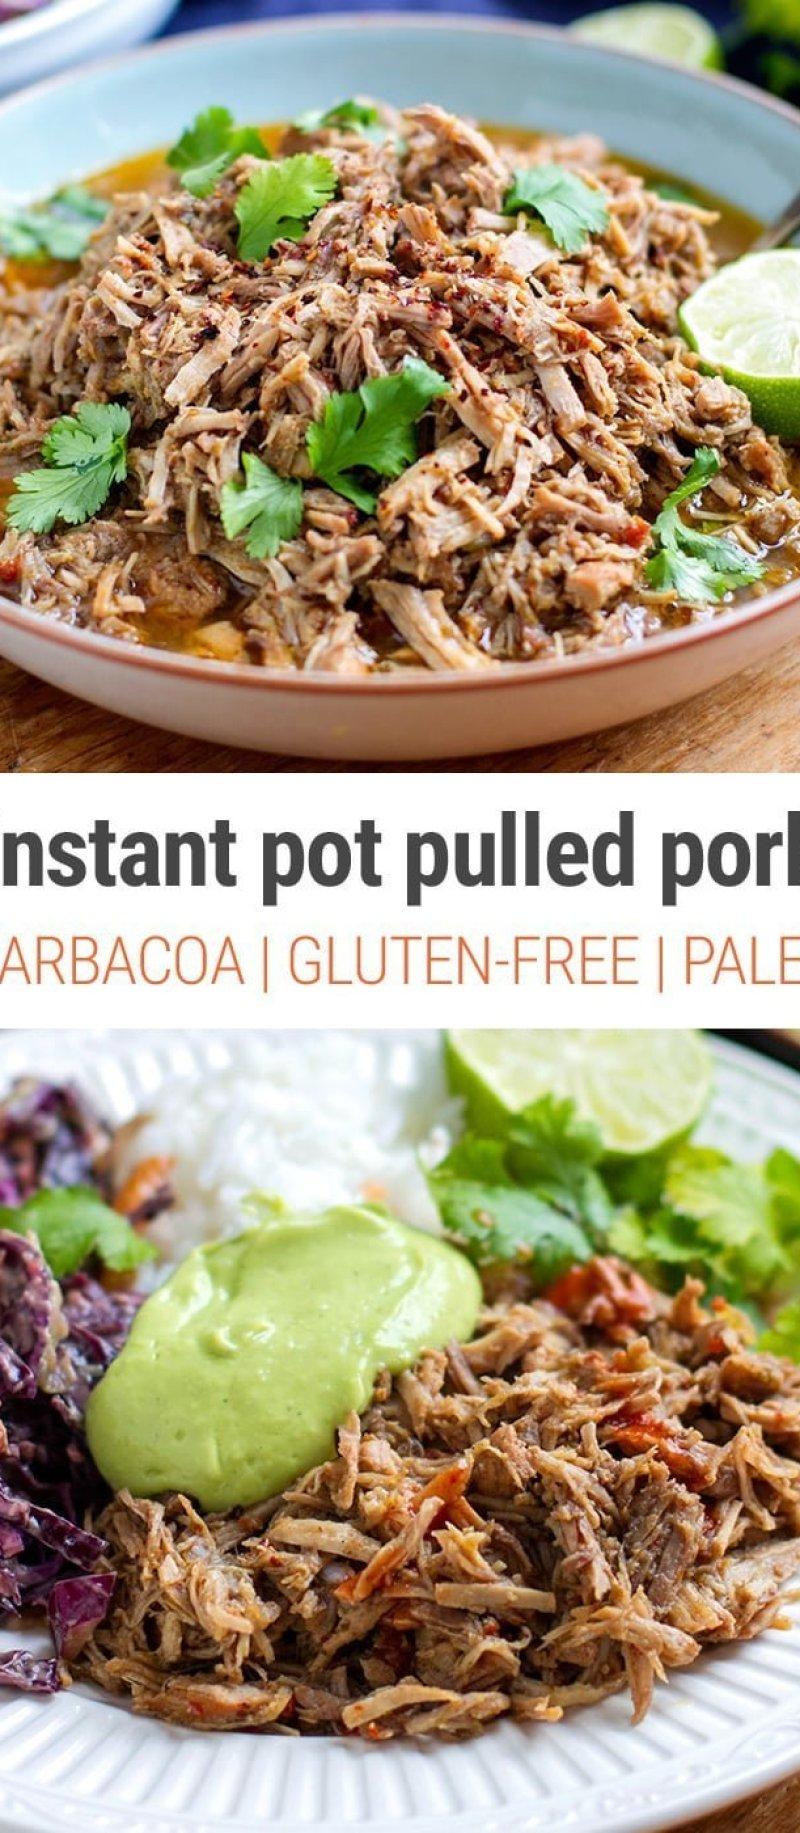 Barbacoa Pulled Pork - Instant Pot Recipe